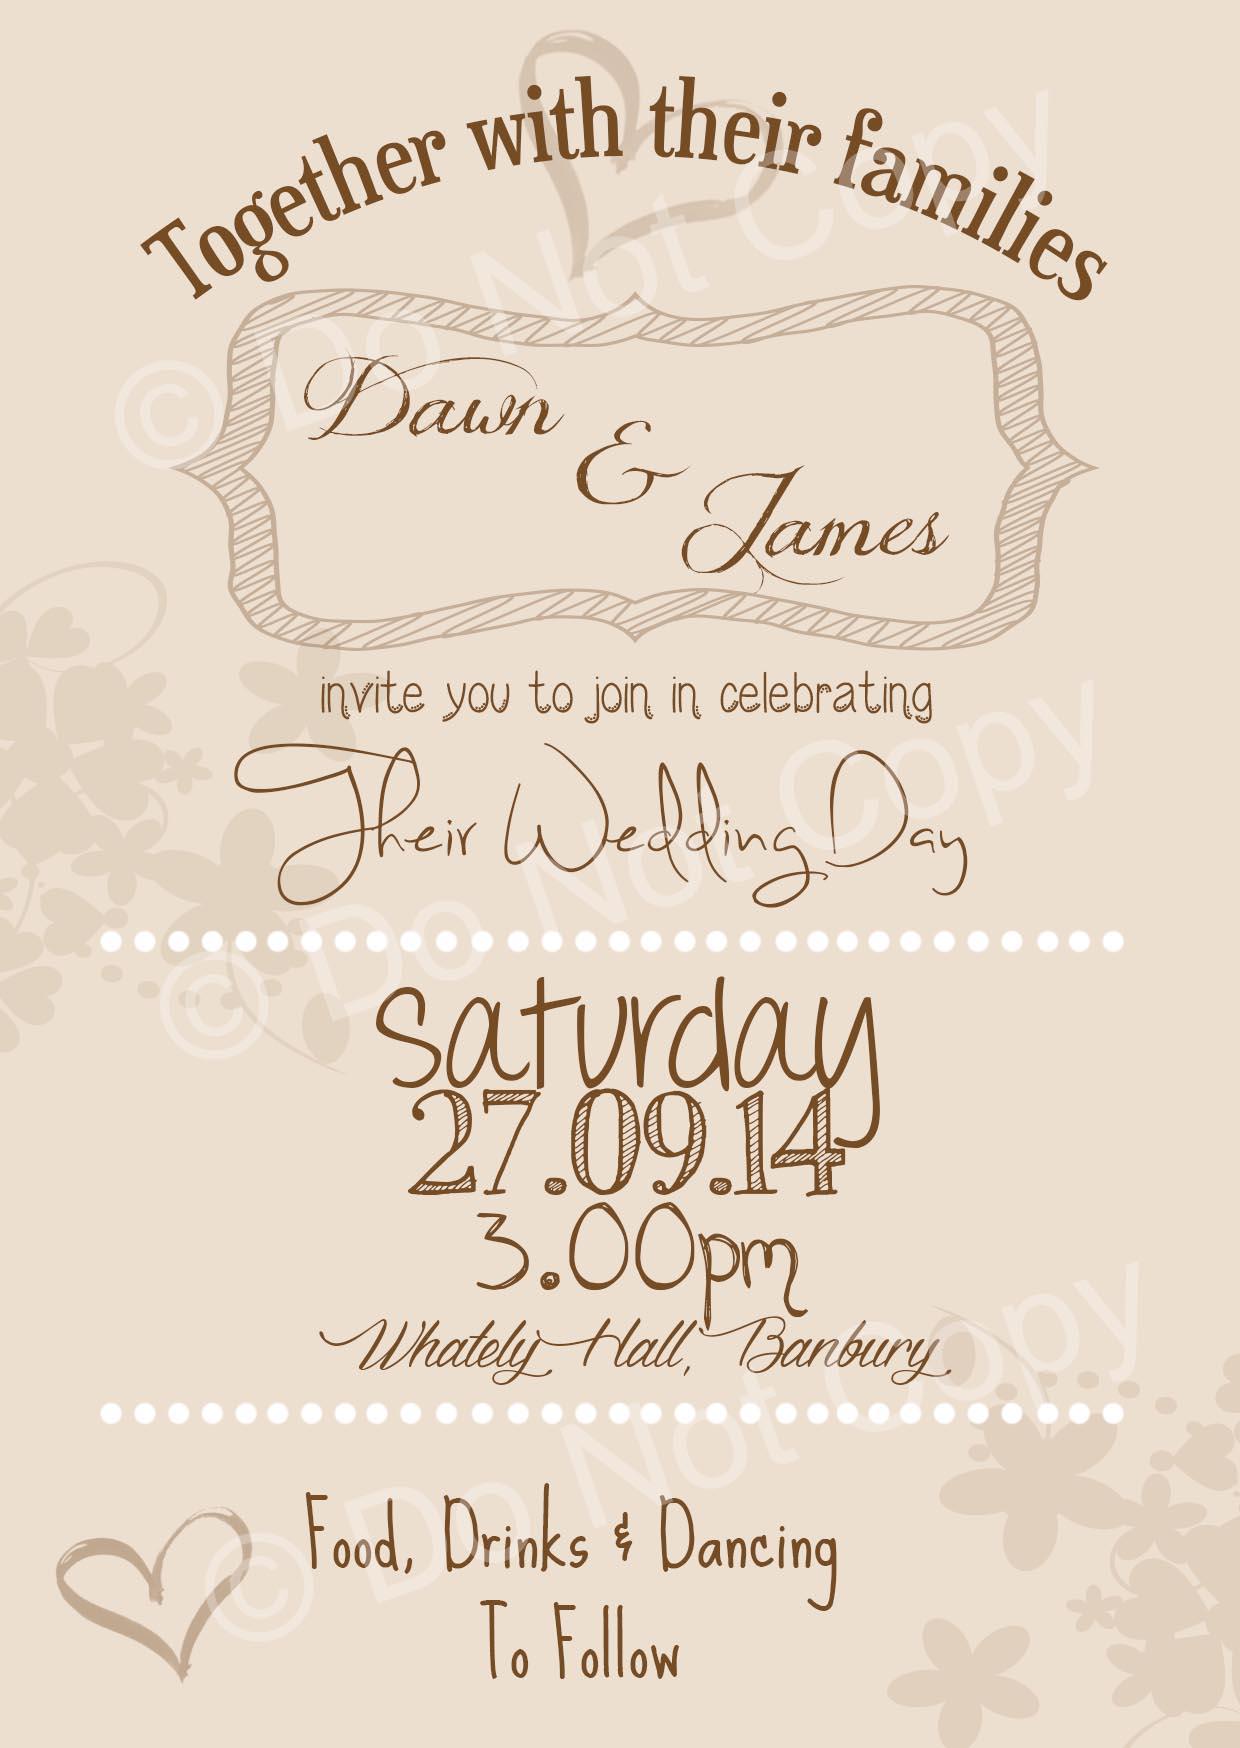 sample wedding invite 2fb.jpg